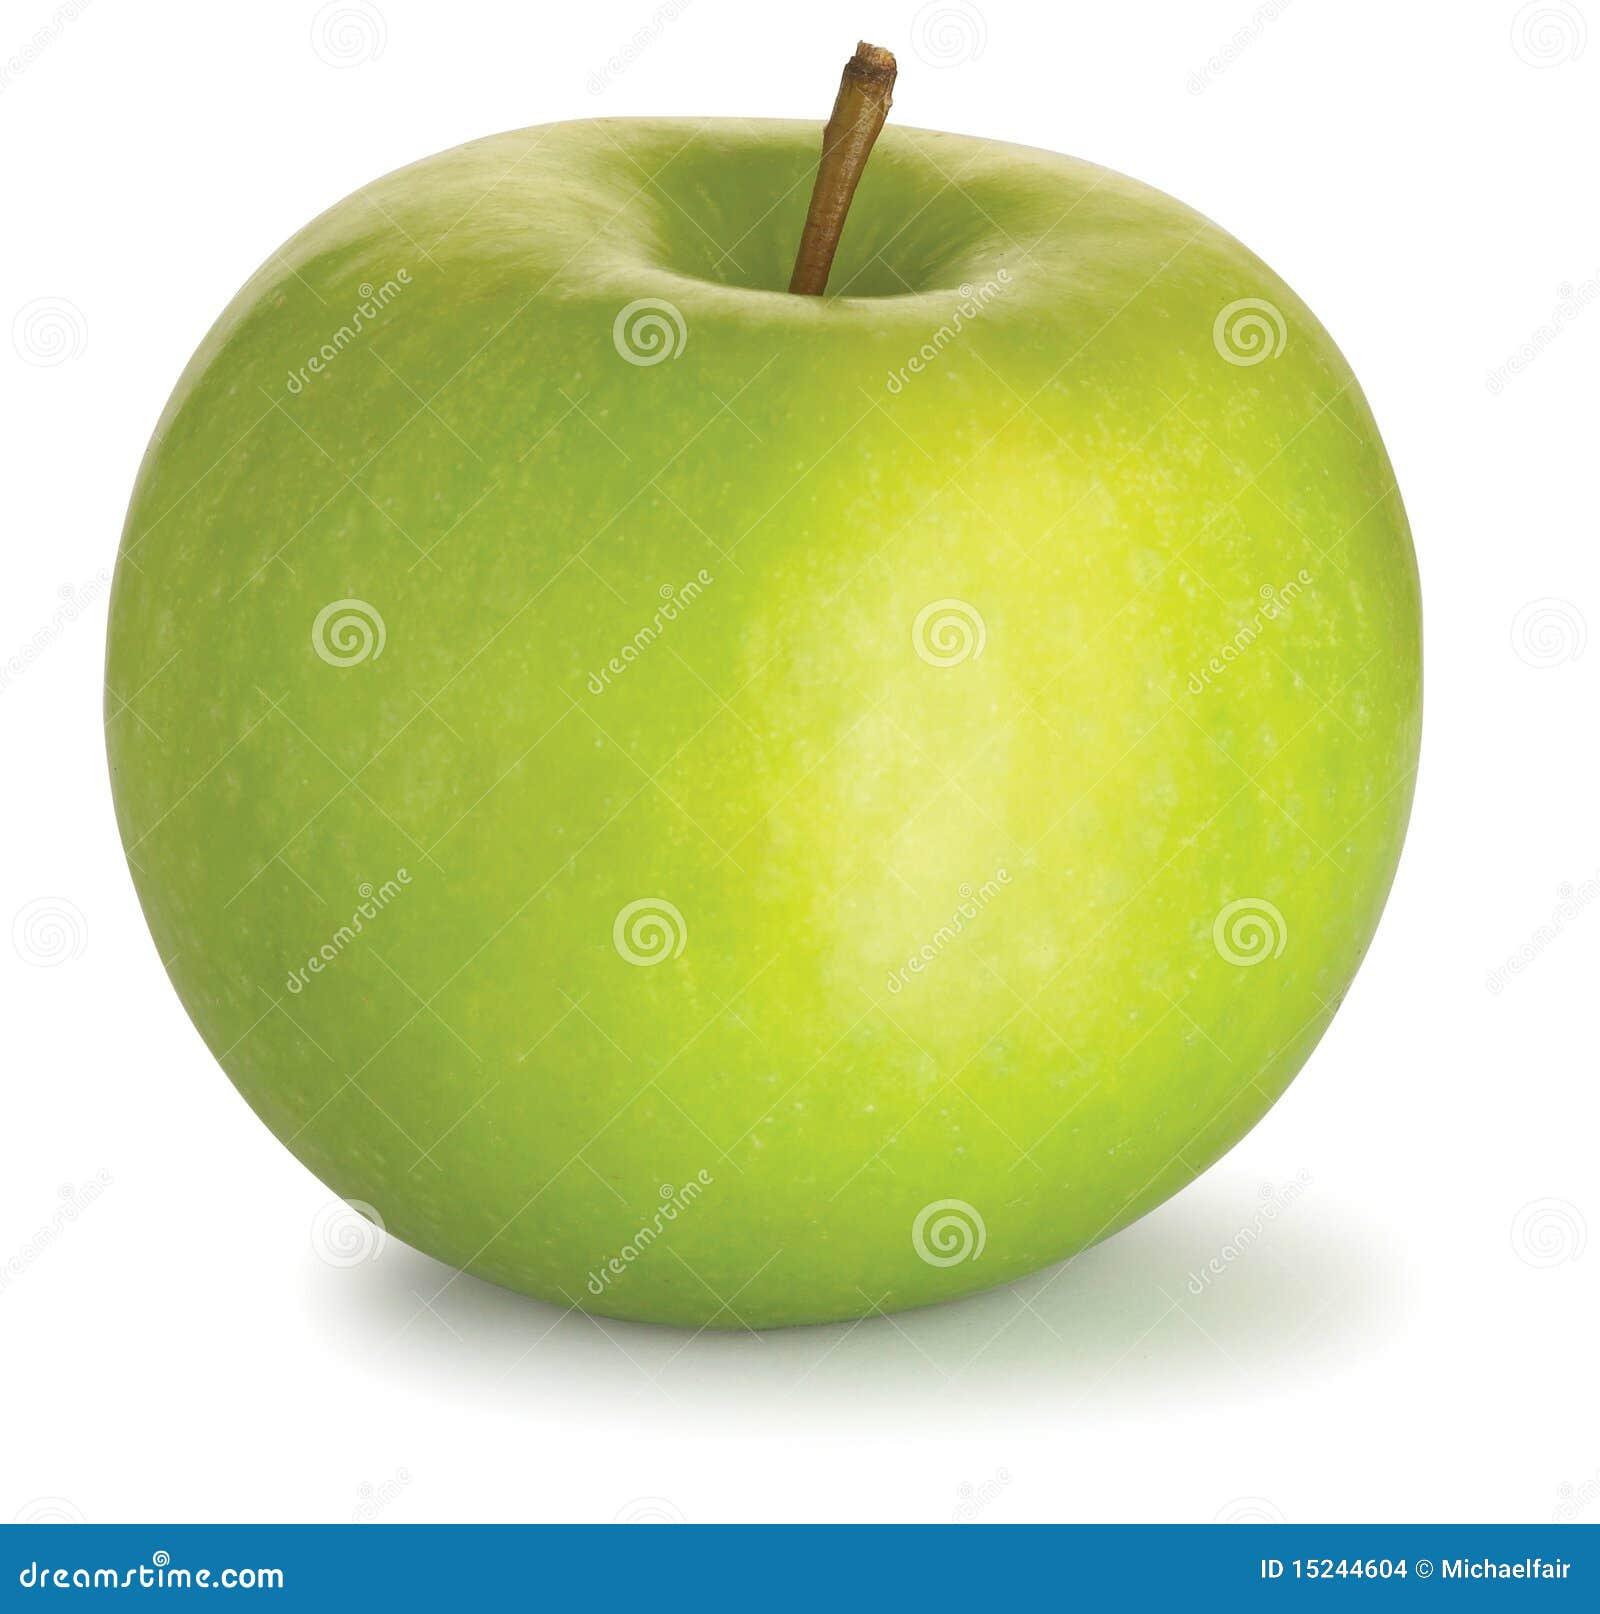 granny smith apple nutrition